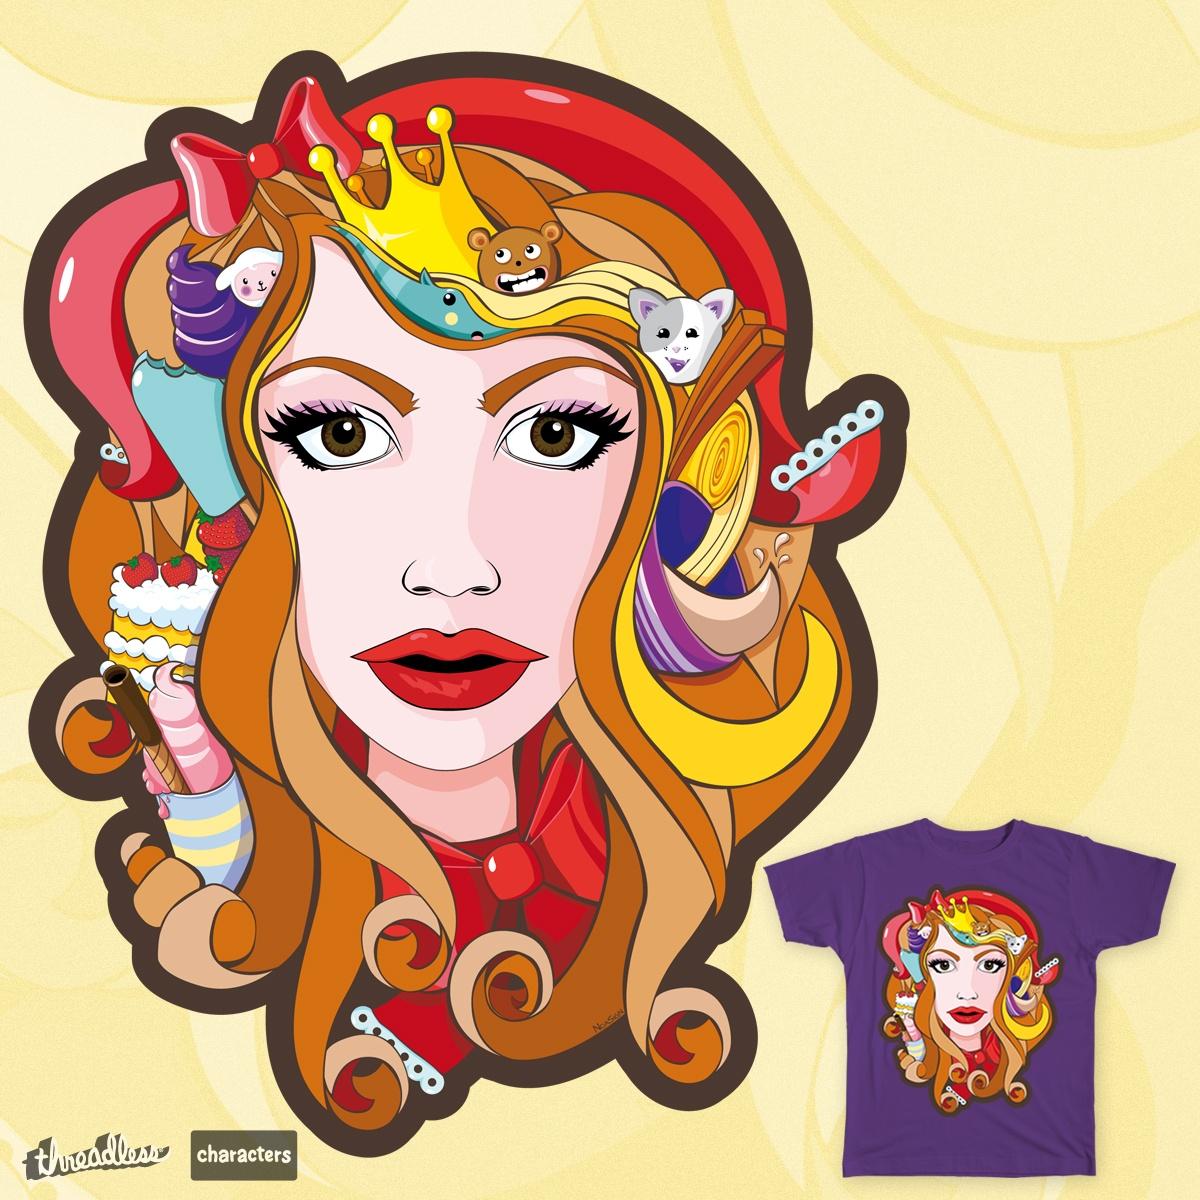 Lady Kawaii by NoaSign on Threadless